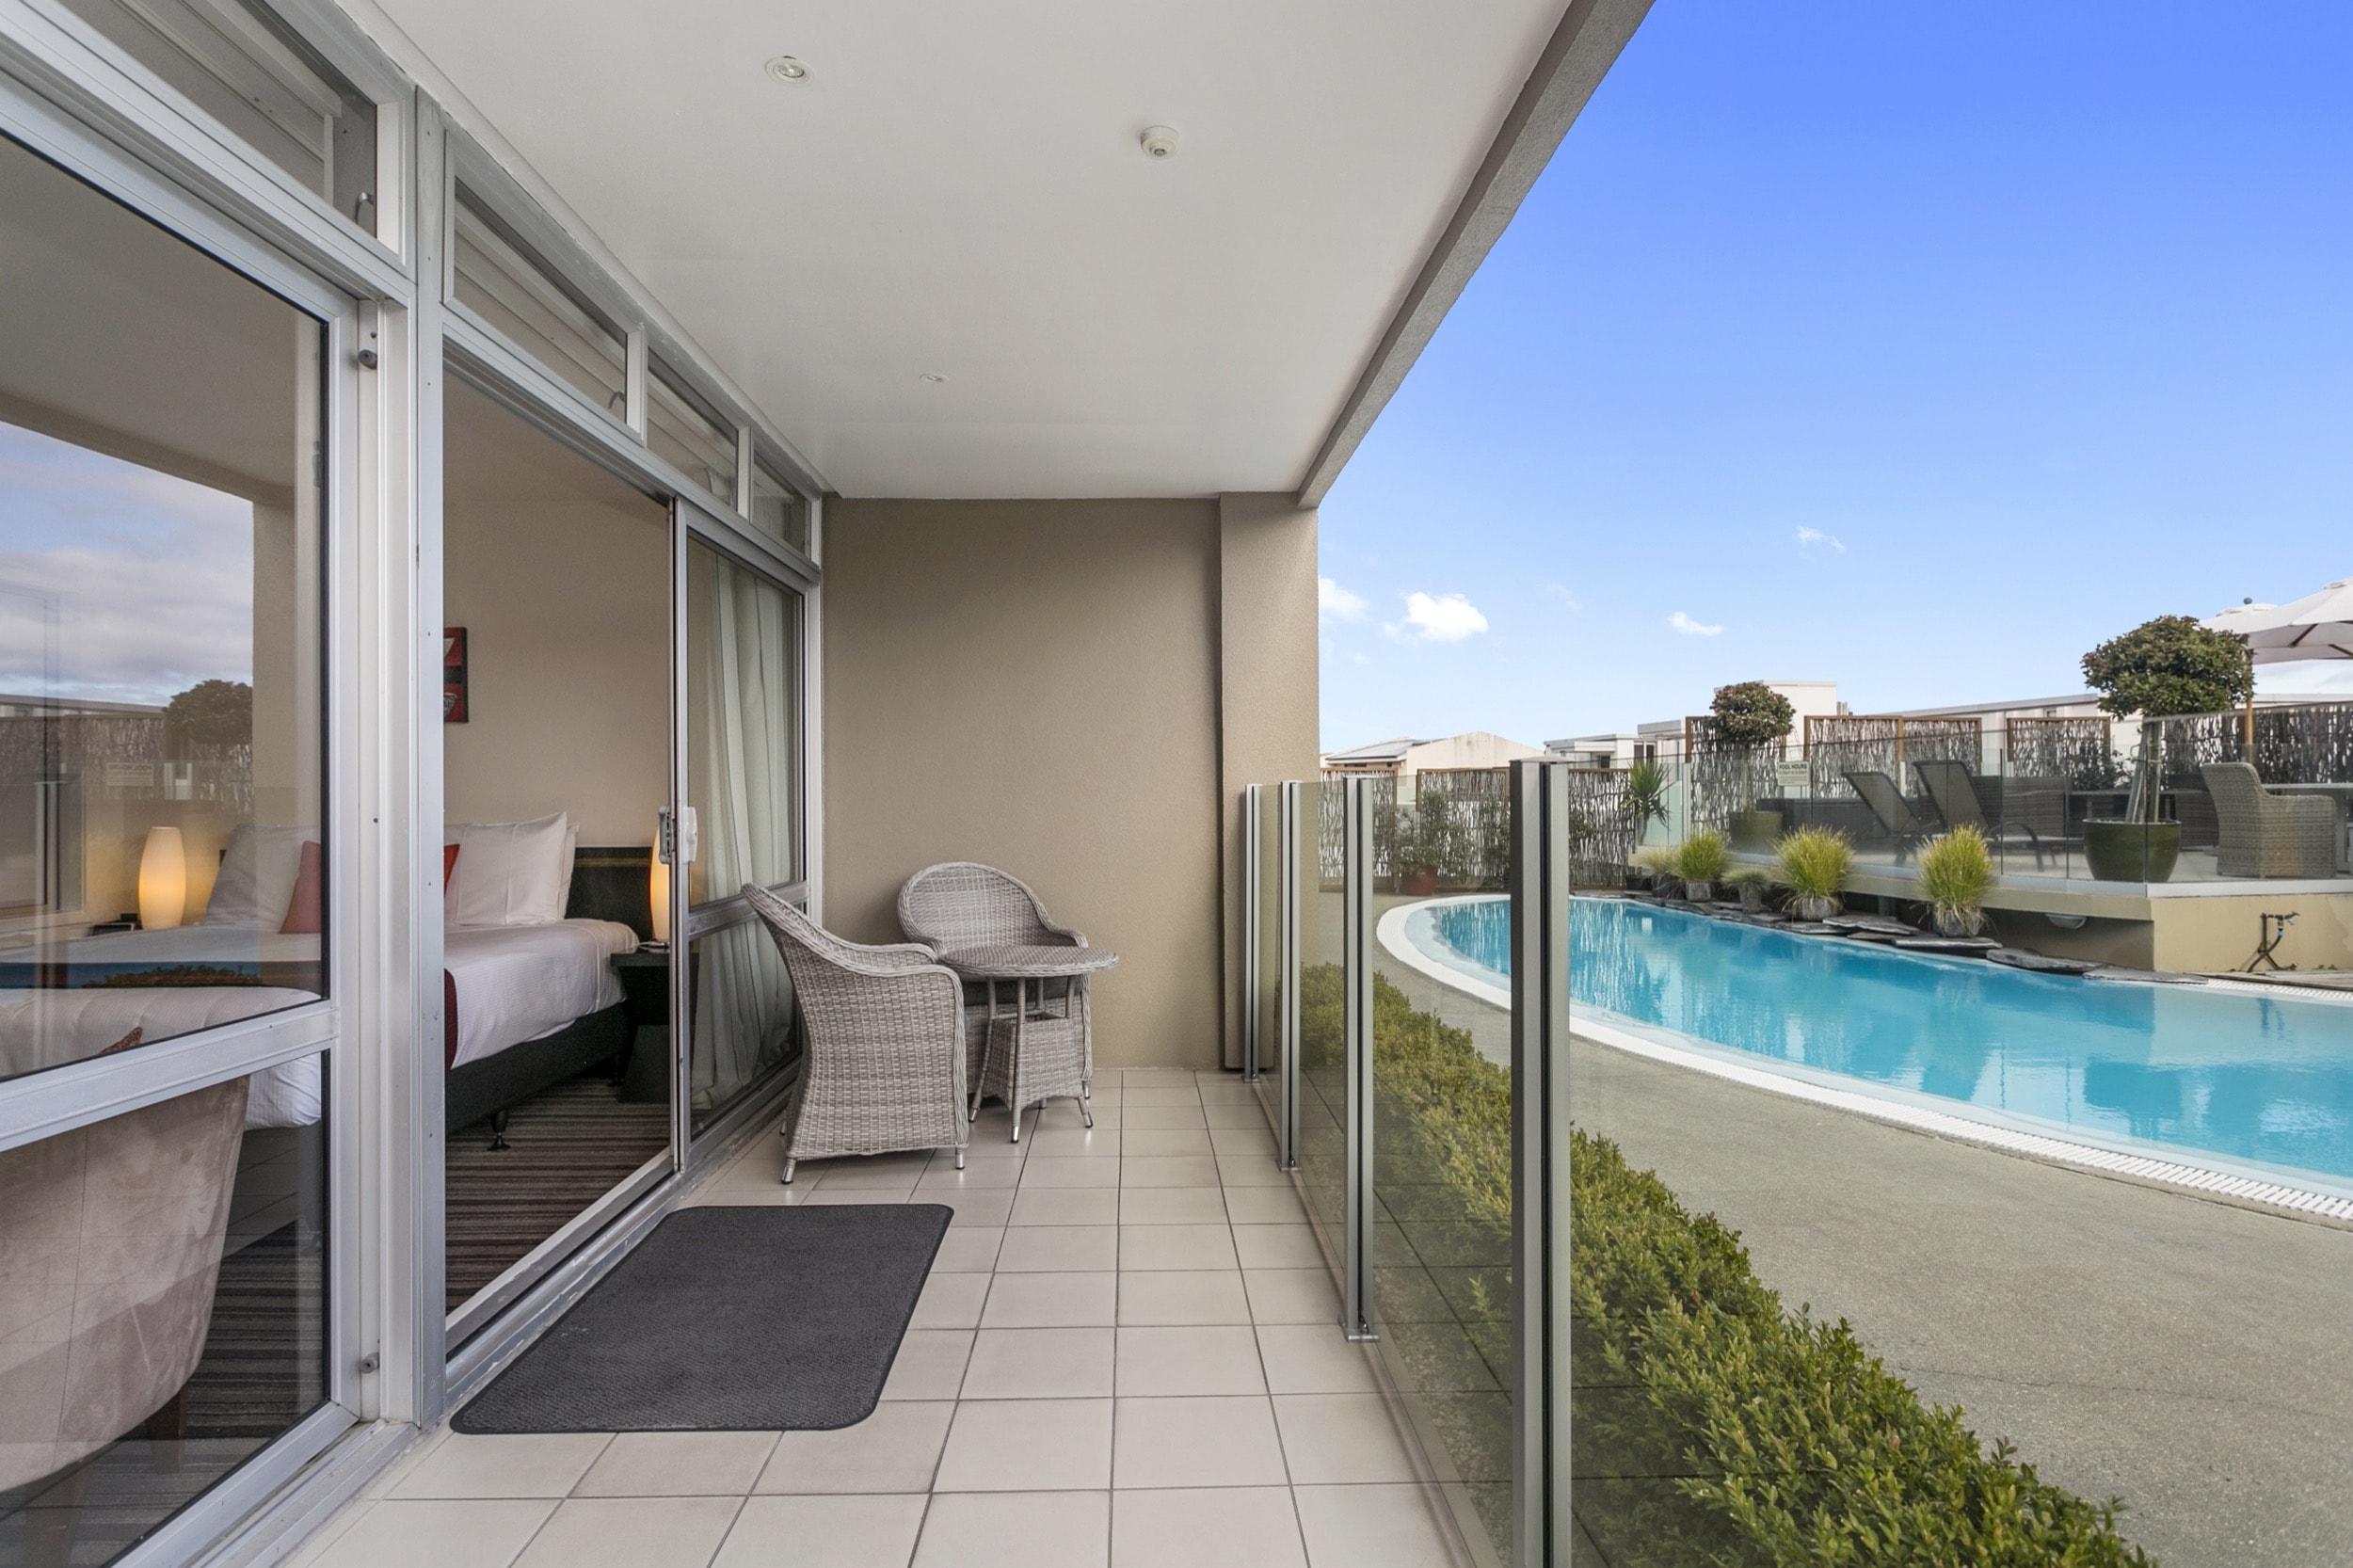 Luxury Studio poolside poolside patio-min.jpg